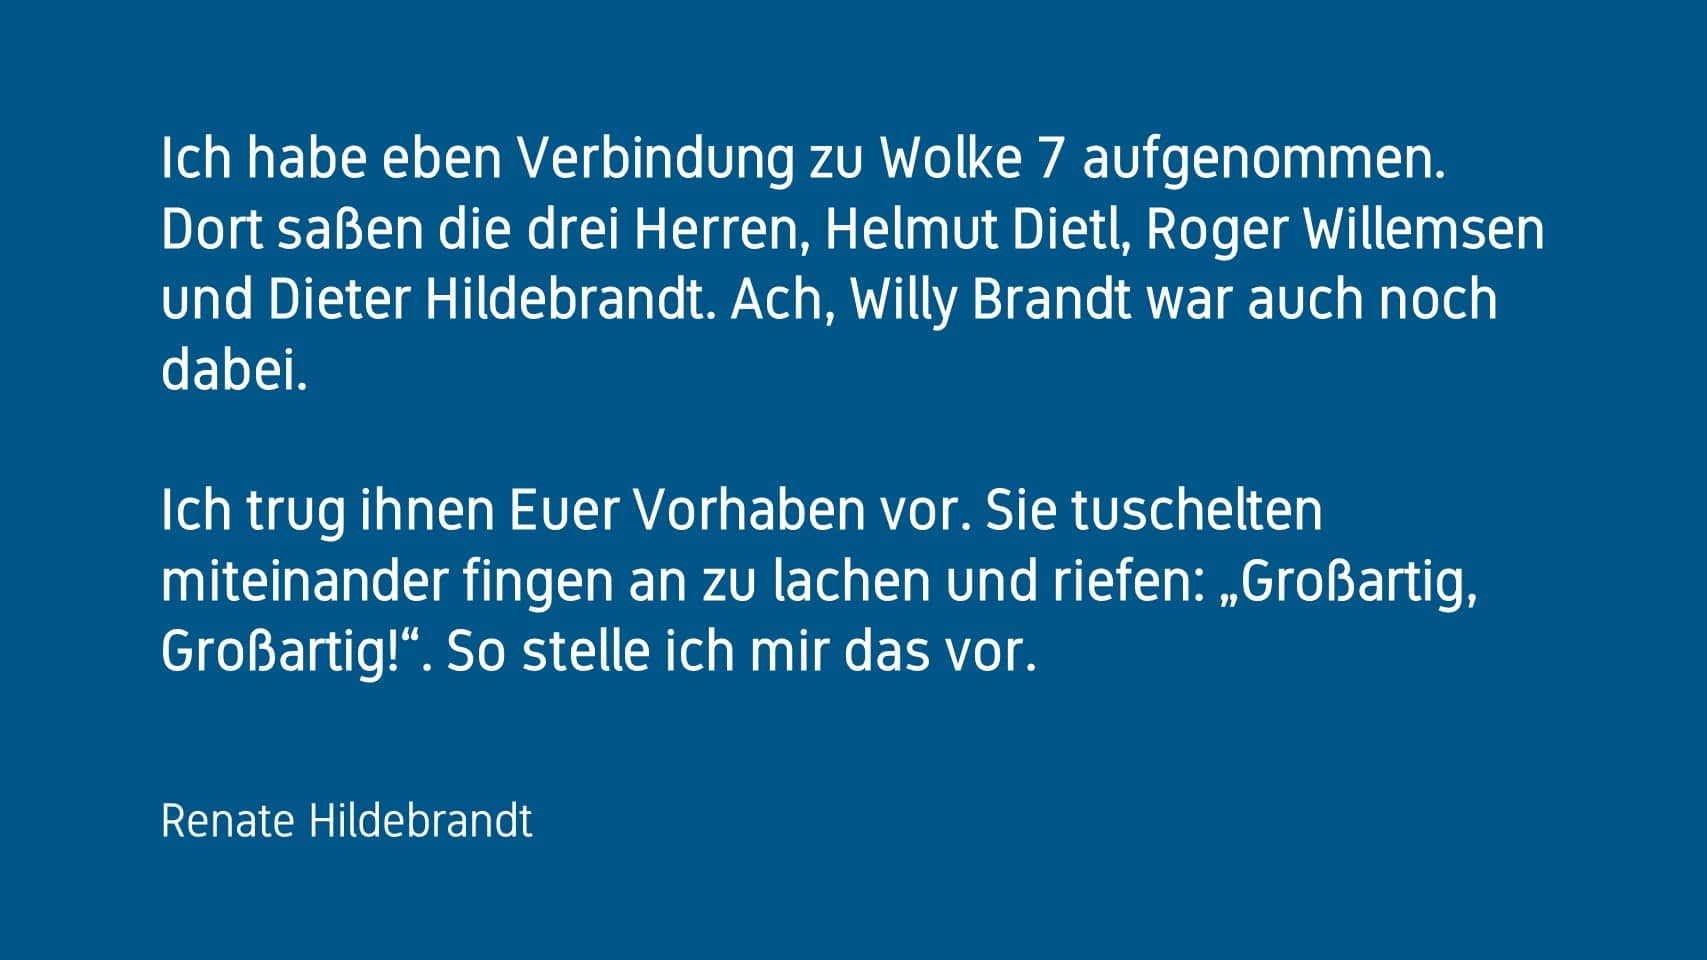 Renate Hildebrandt